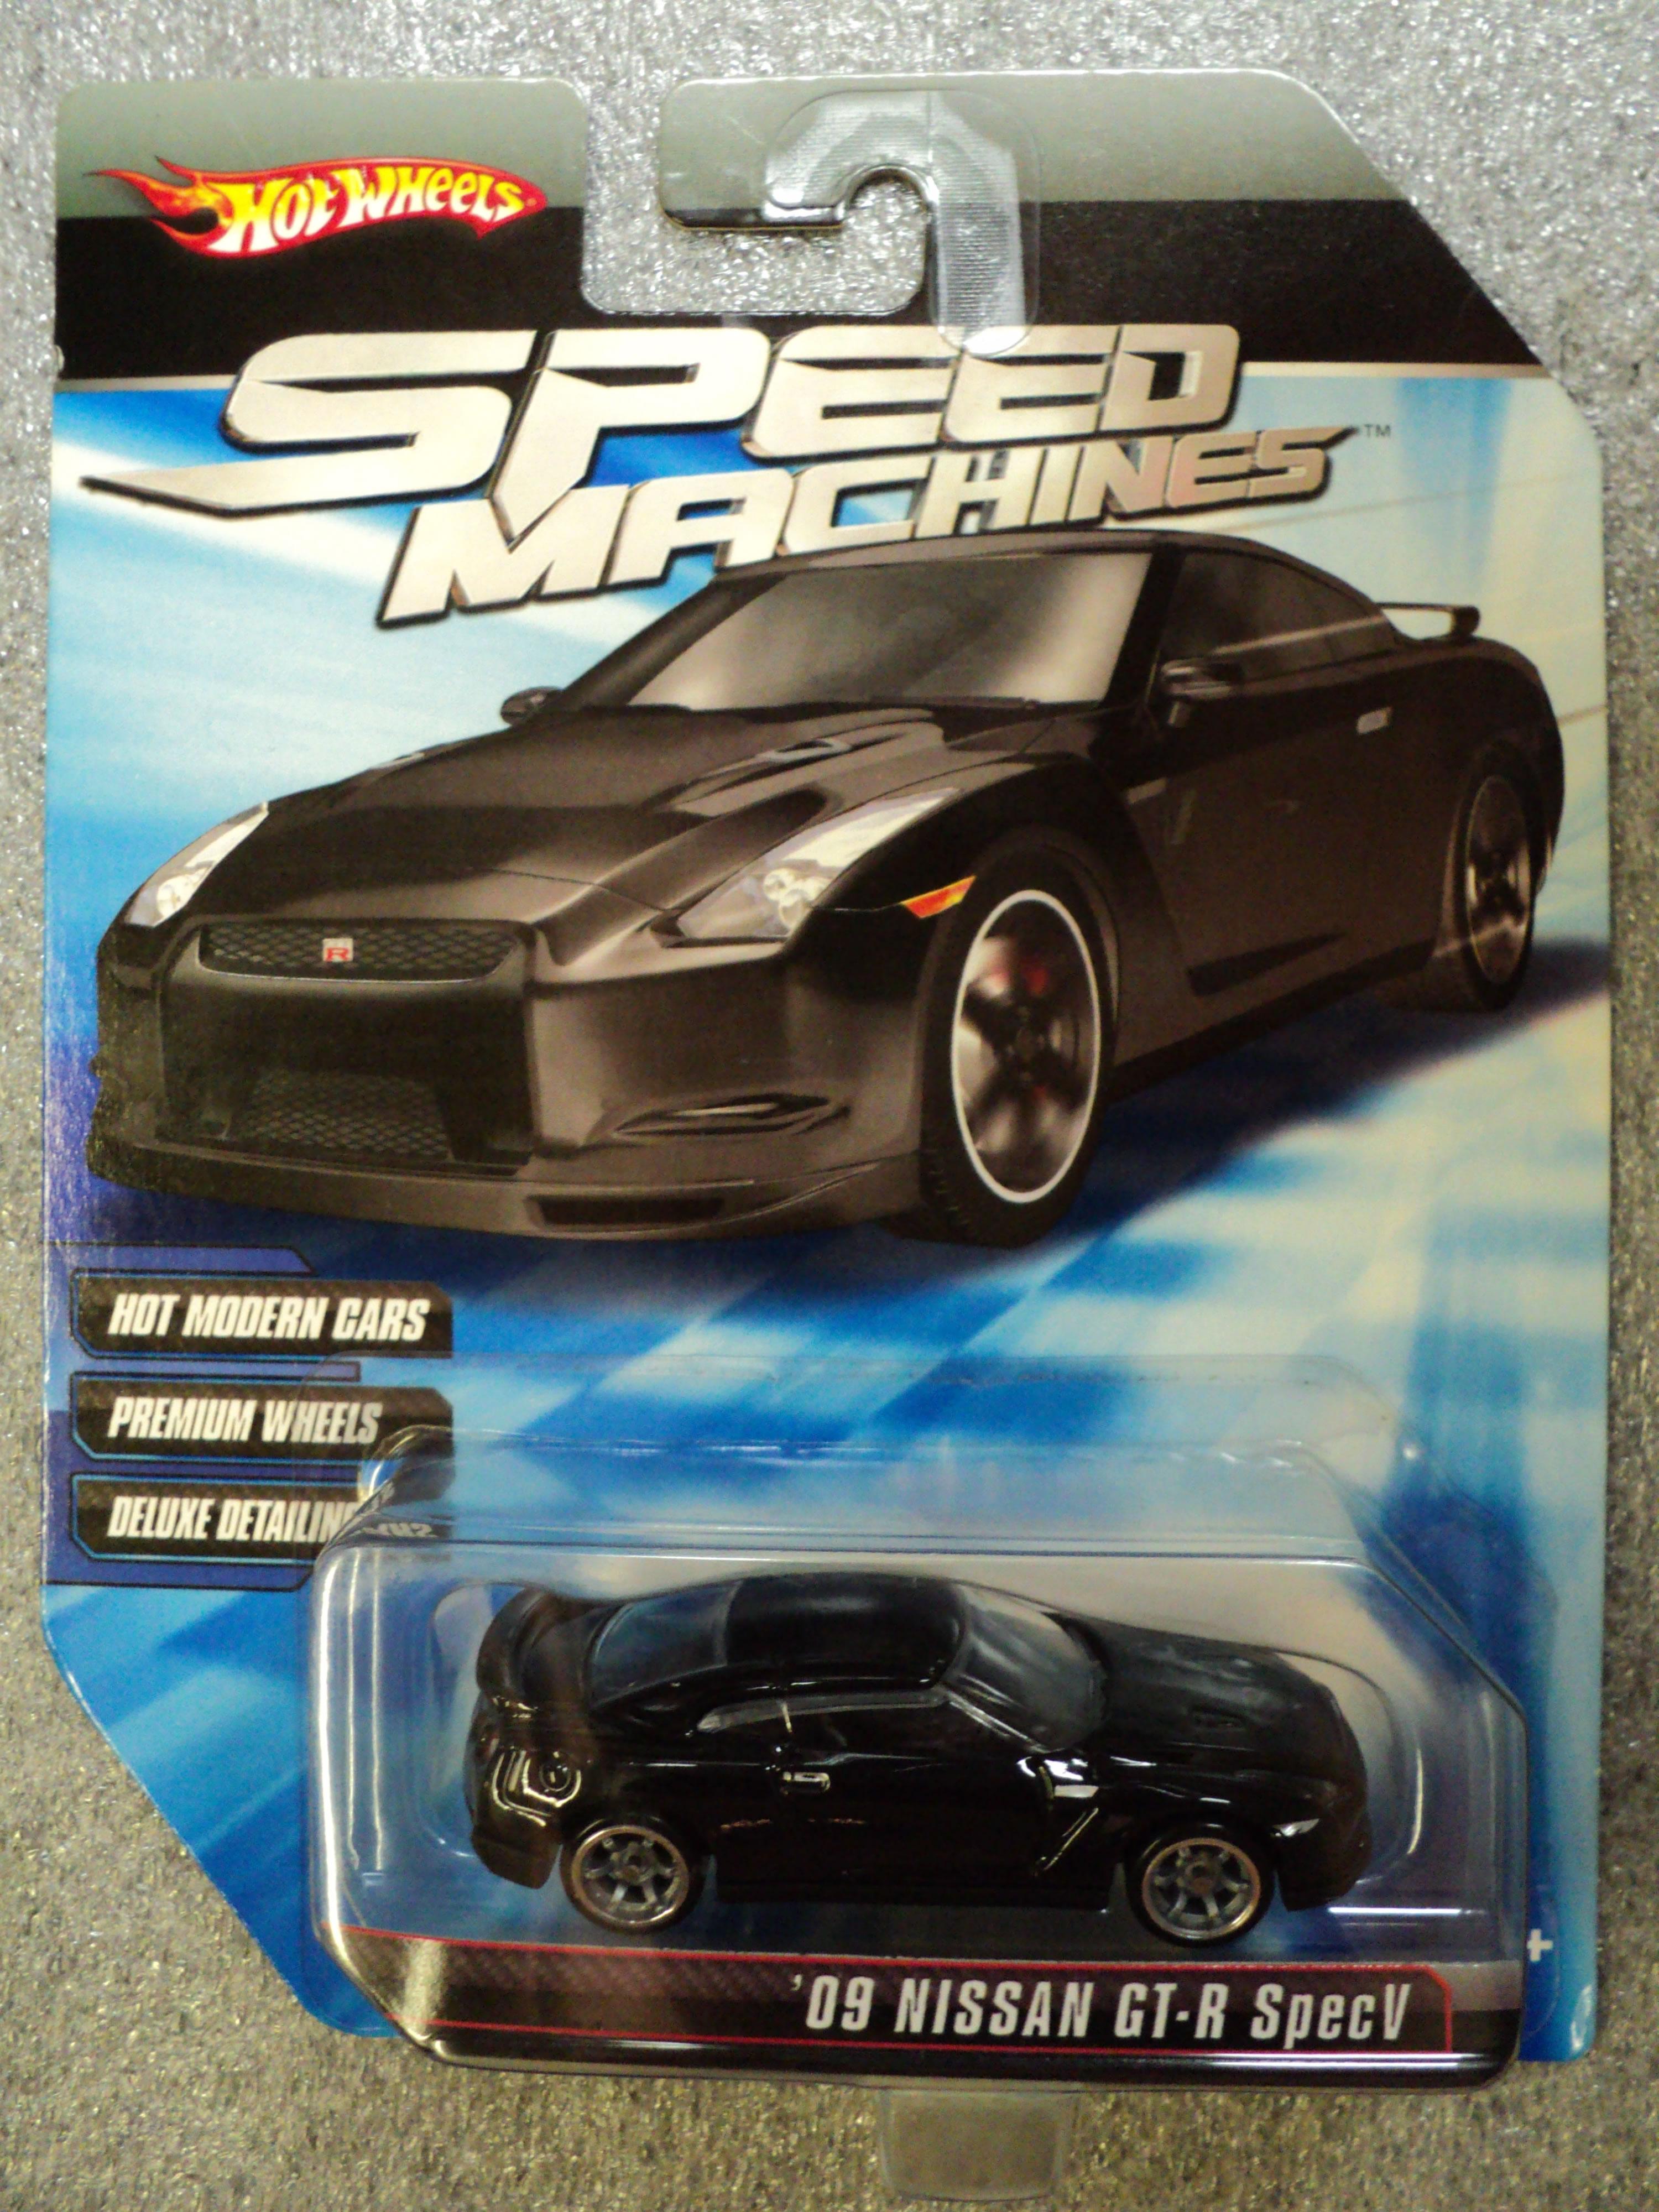 Hot Wheels 2010 2011 Speed Machines 09 Nissan Gt R Specv Black Spec V